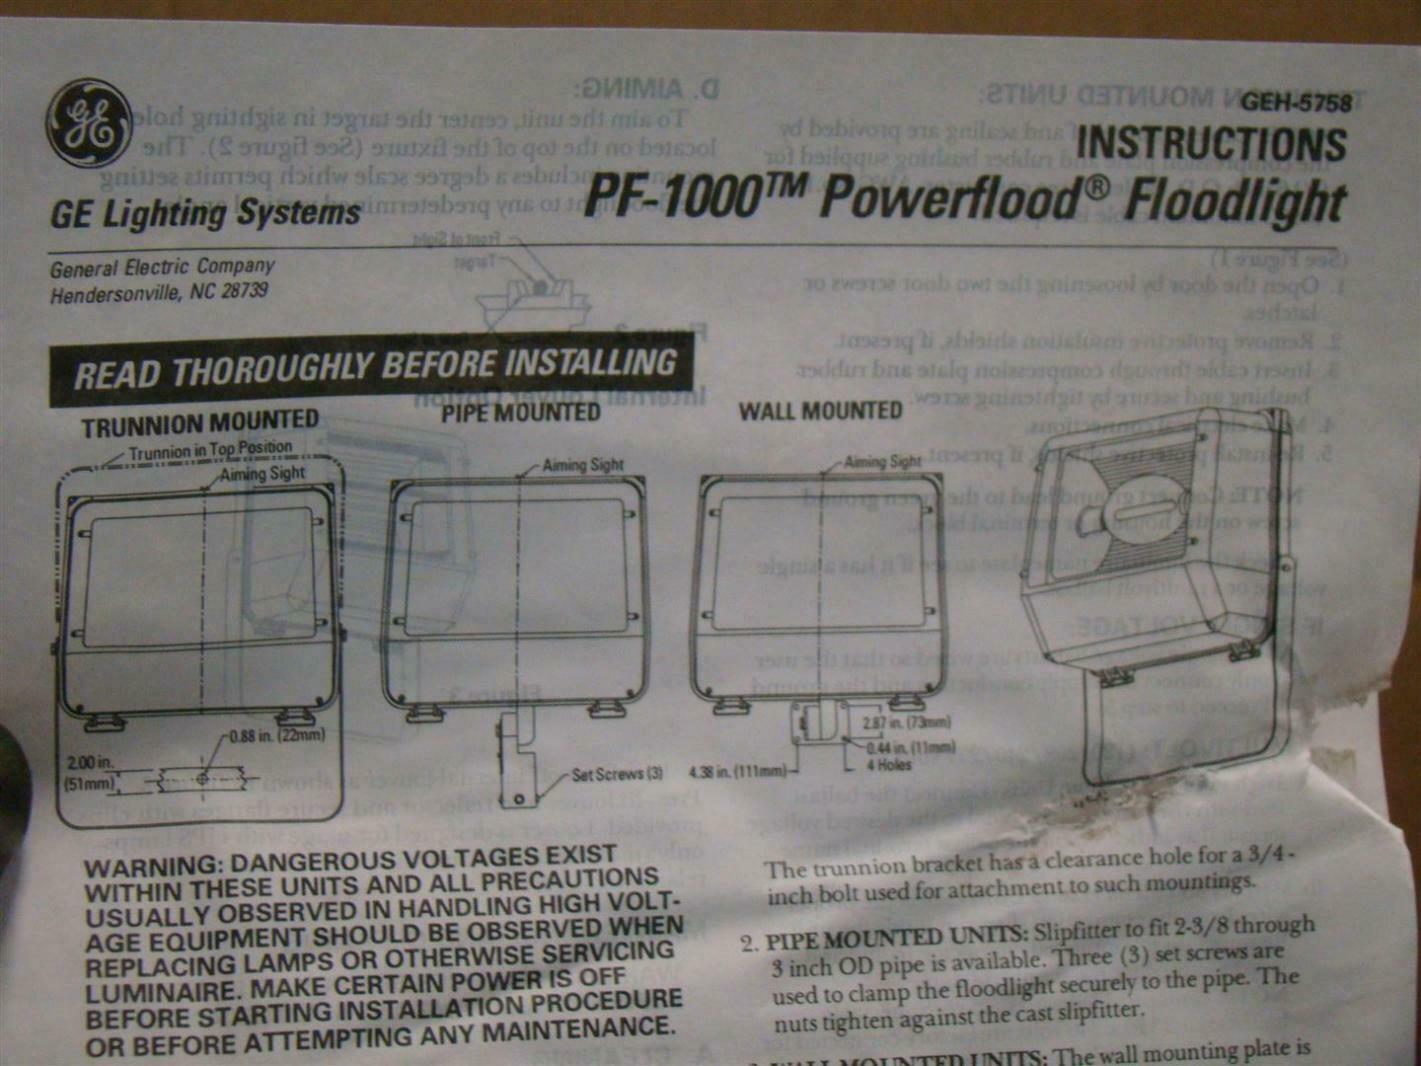 Ge lighting systems powerflood 1000w outdoor light hps 480v pf1000 ge lighting systems powerflood 1000w outdoor light hps 480v pf1000 aloadofball Image collections